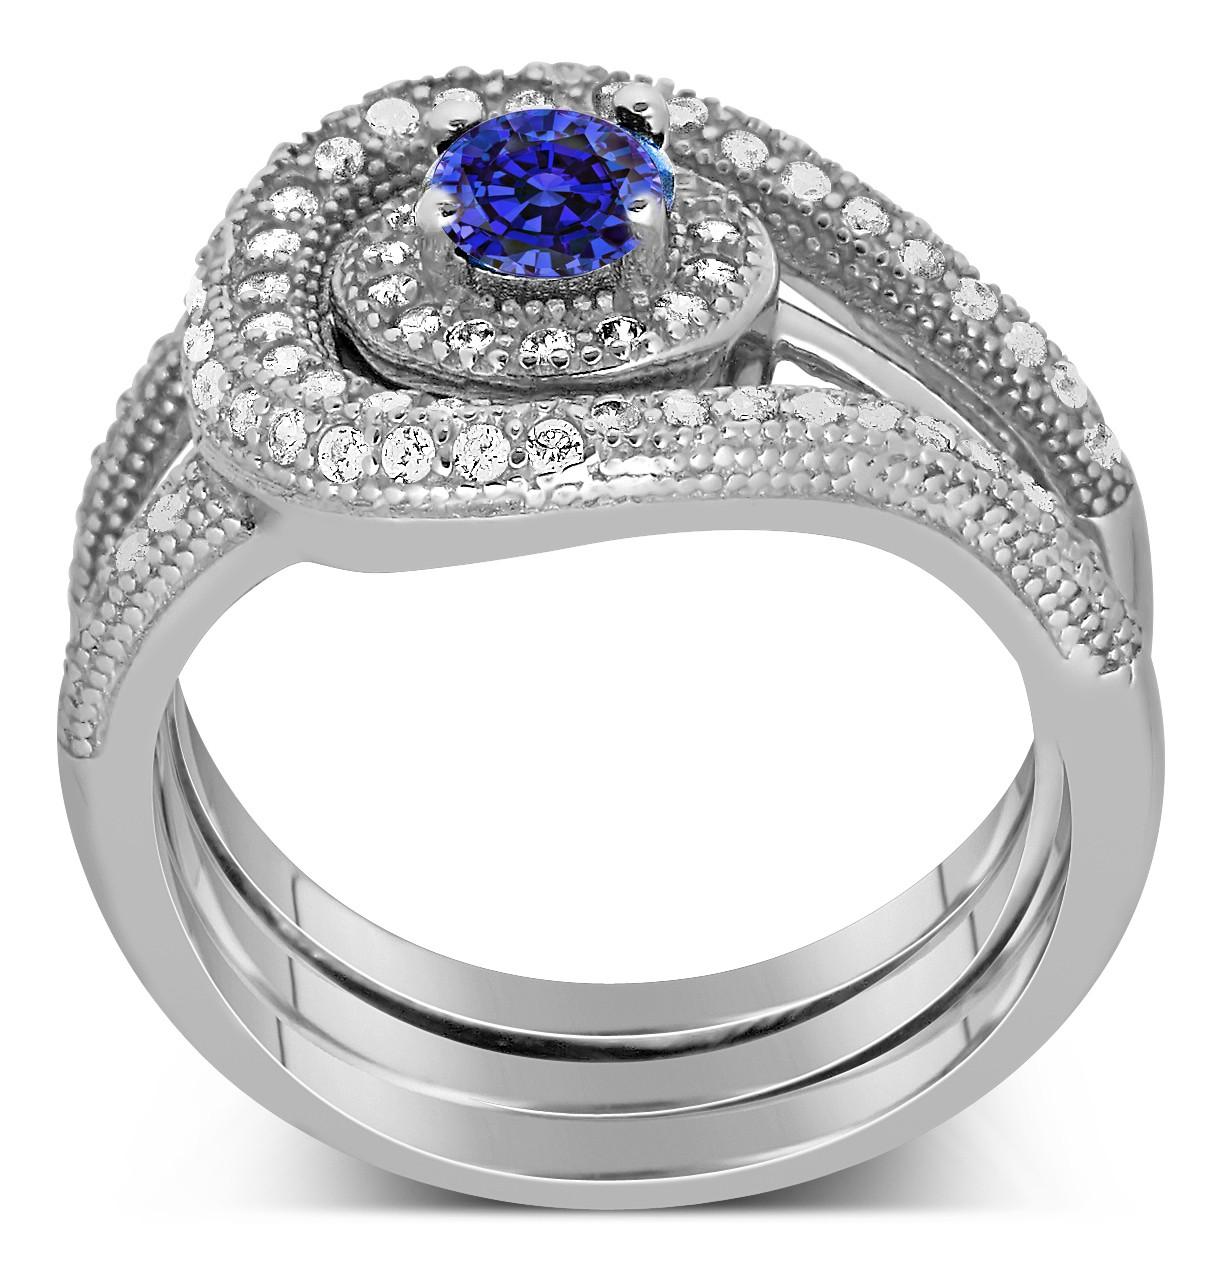 unique and luxurious, 2 carat designer sapphire and diamond